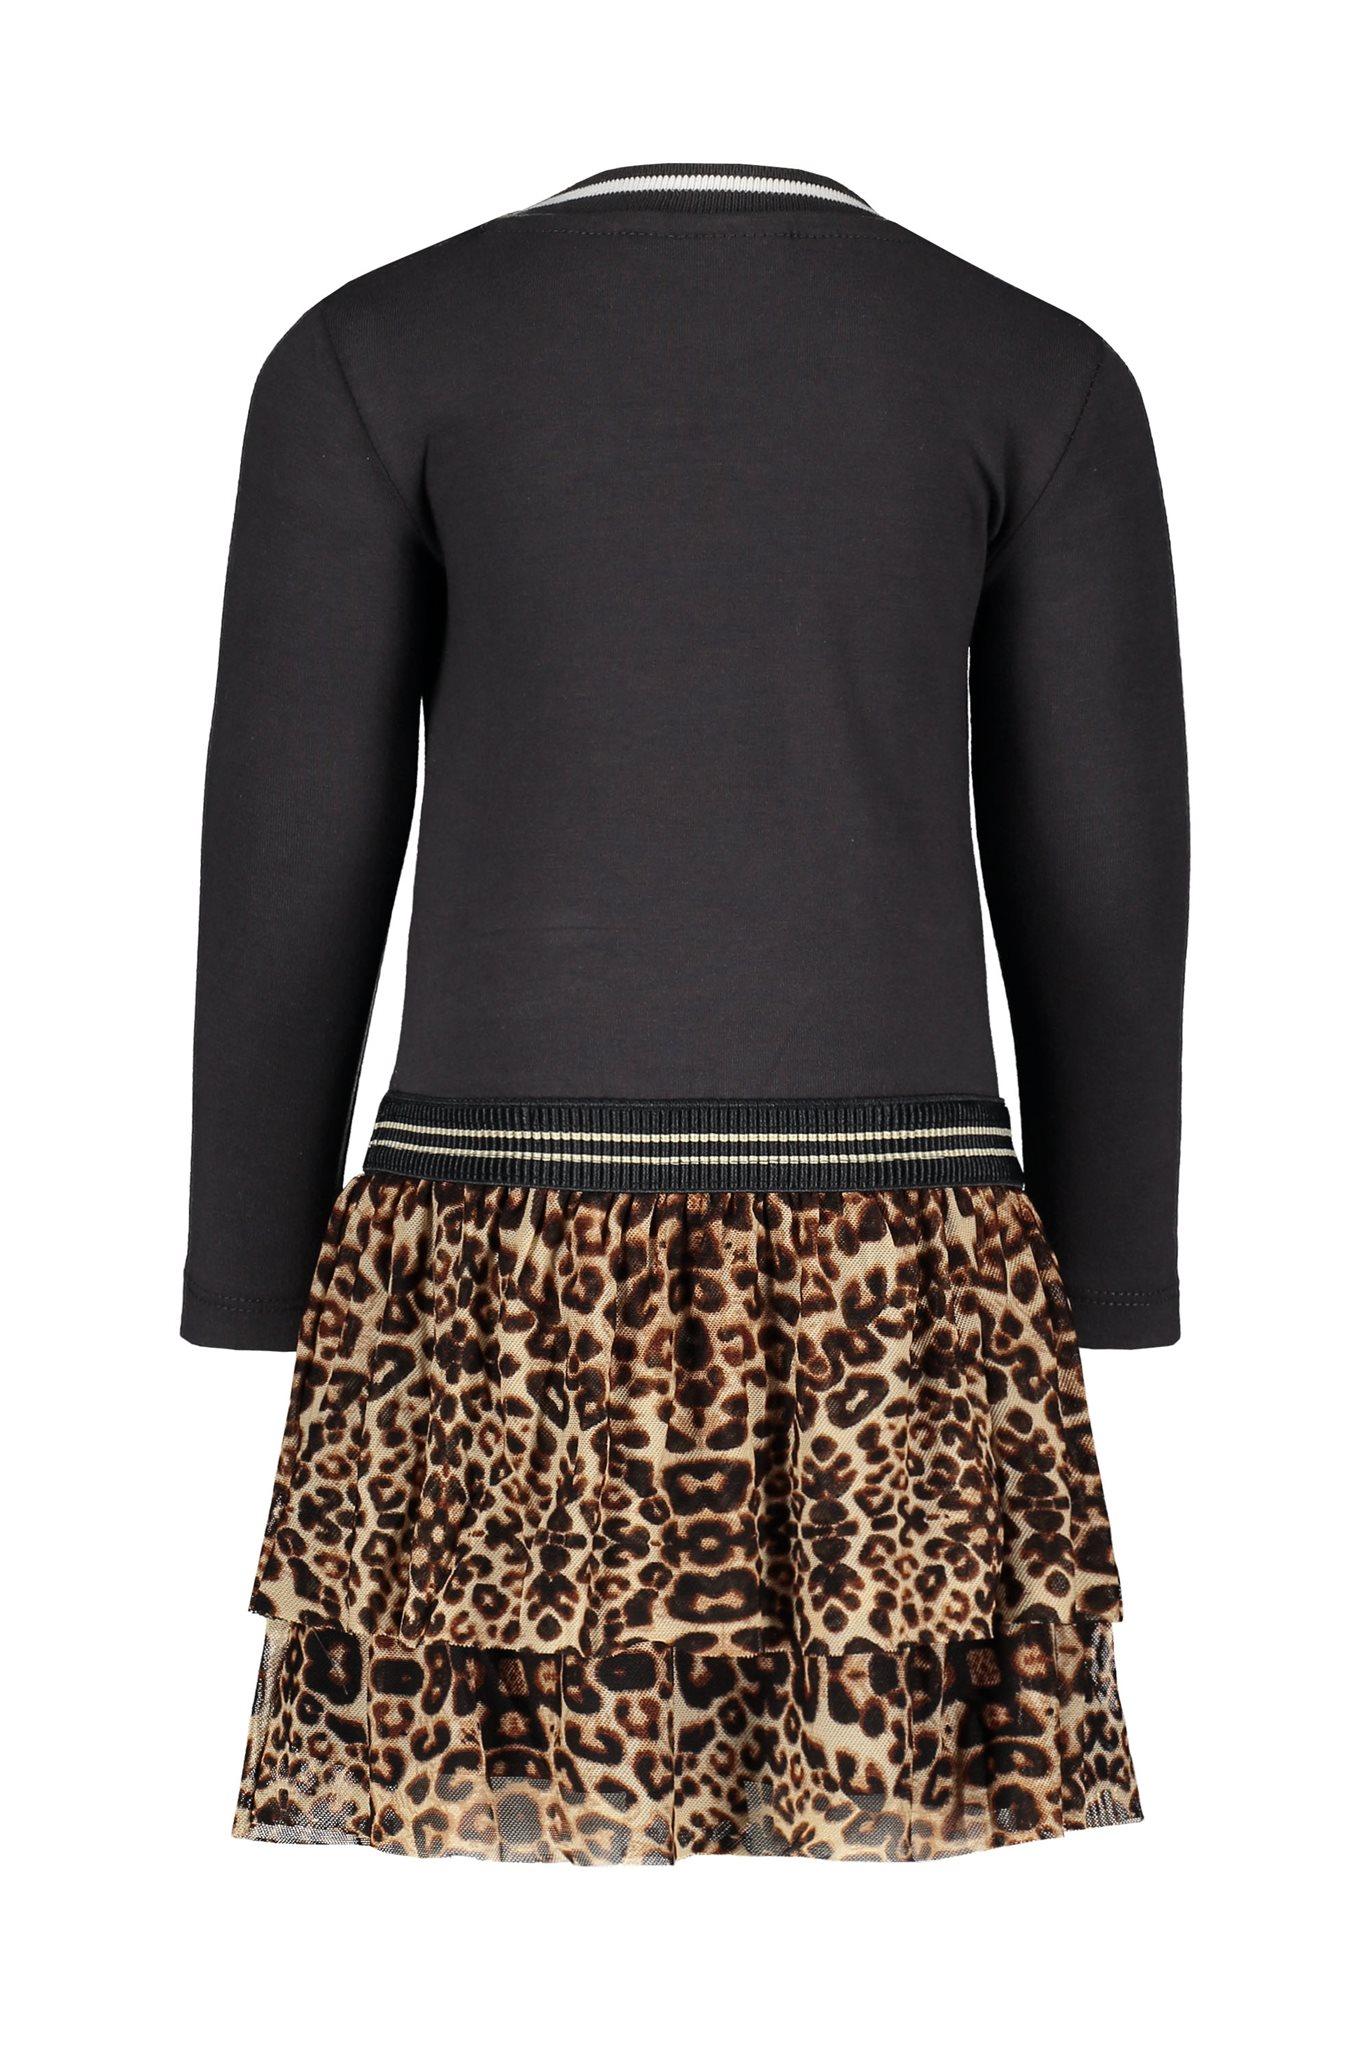 Flo baby girls jersey ls dress